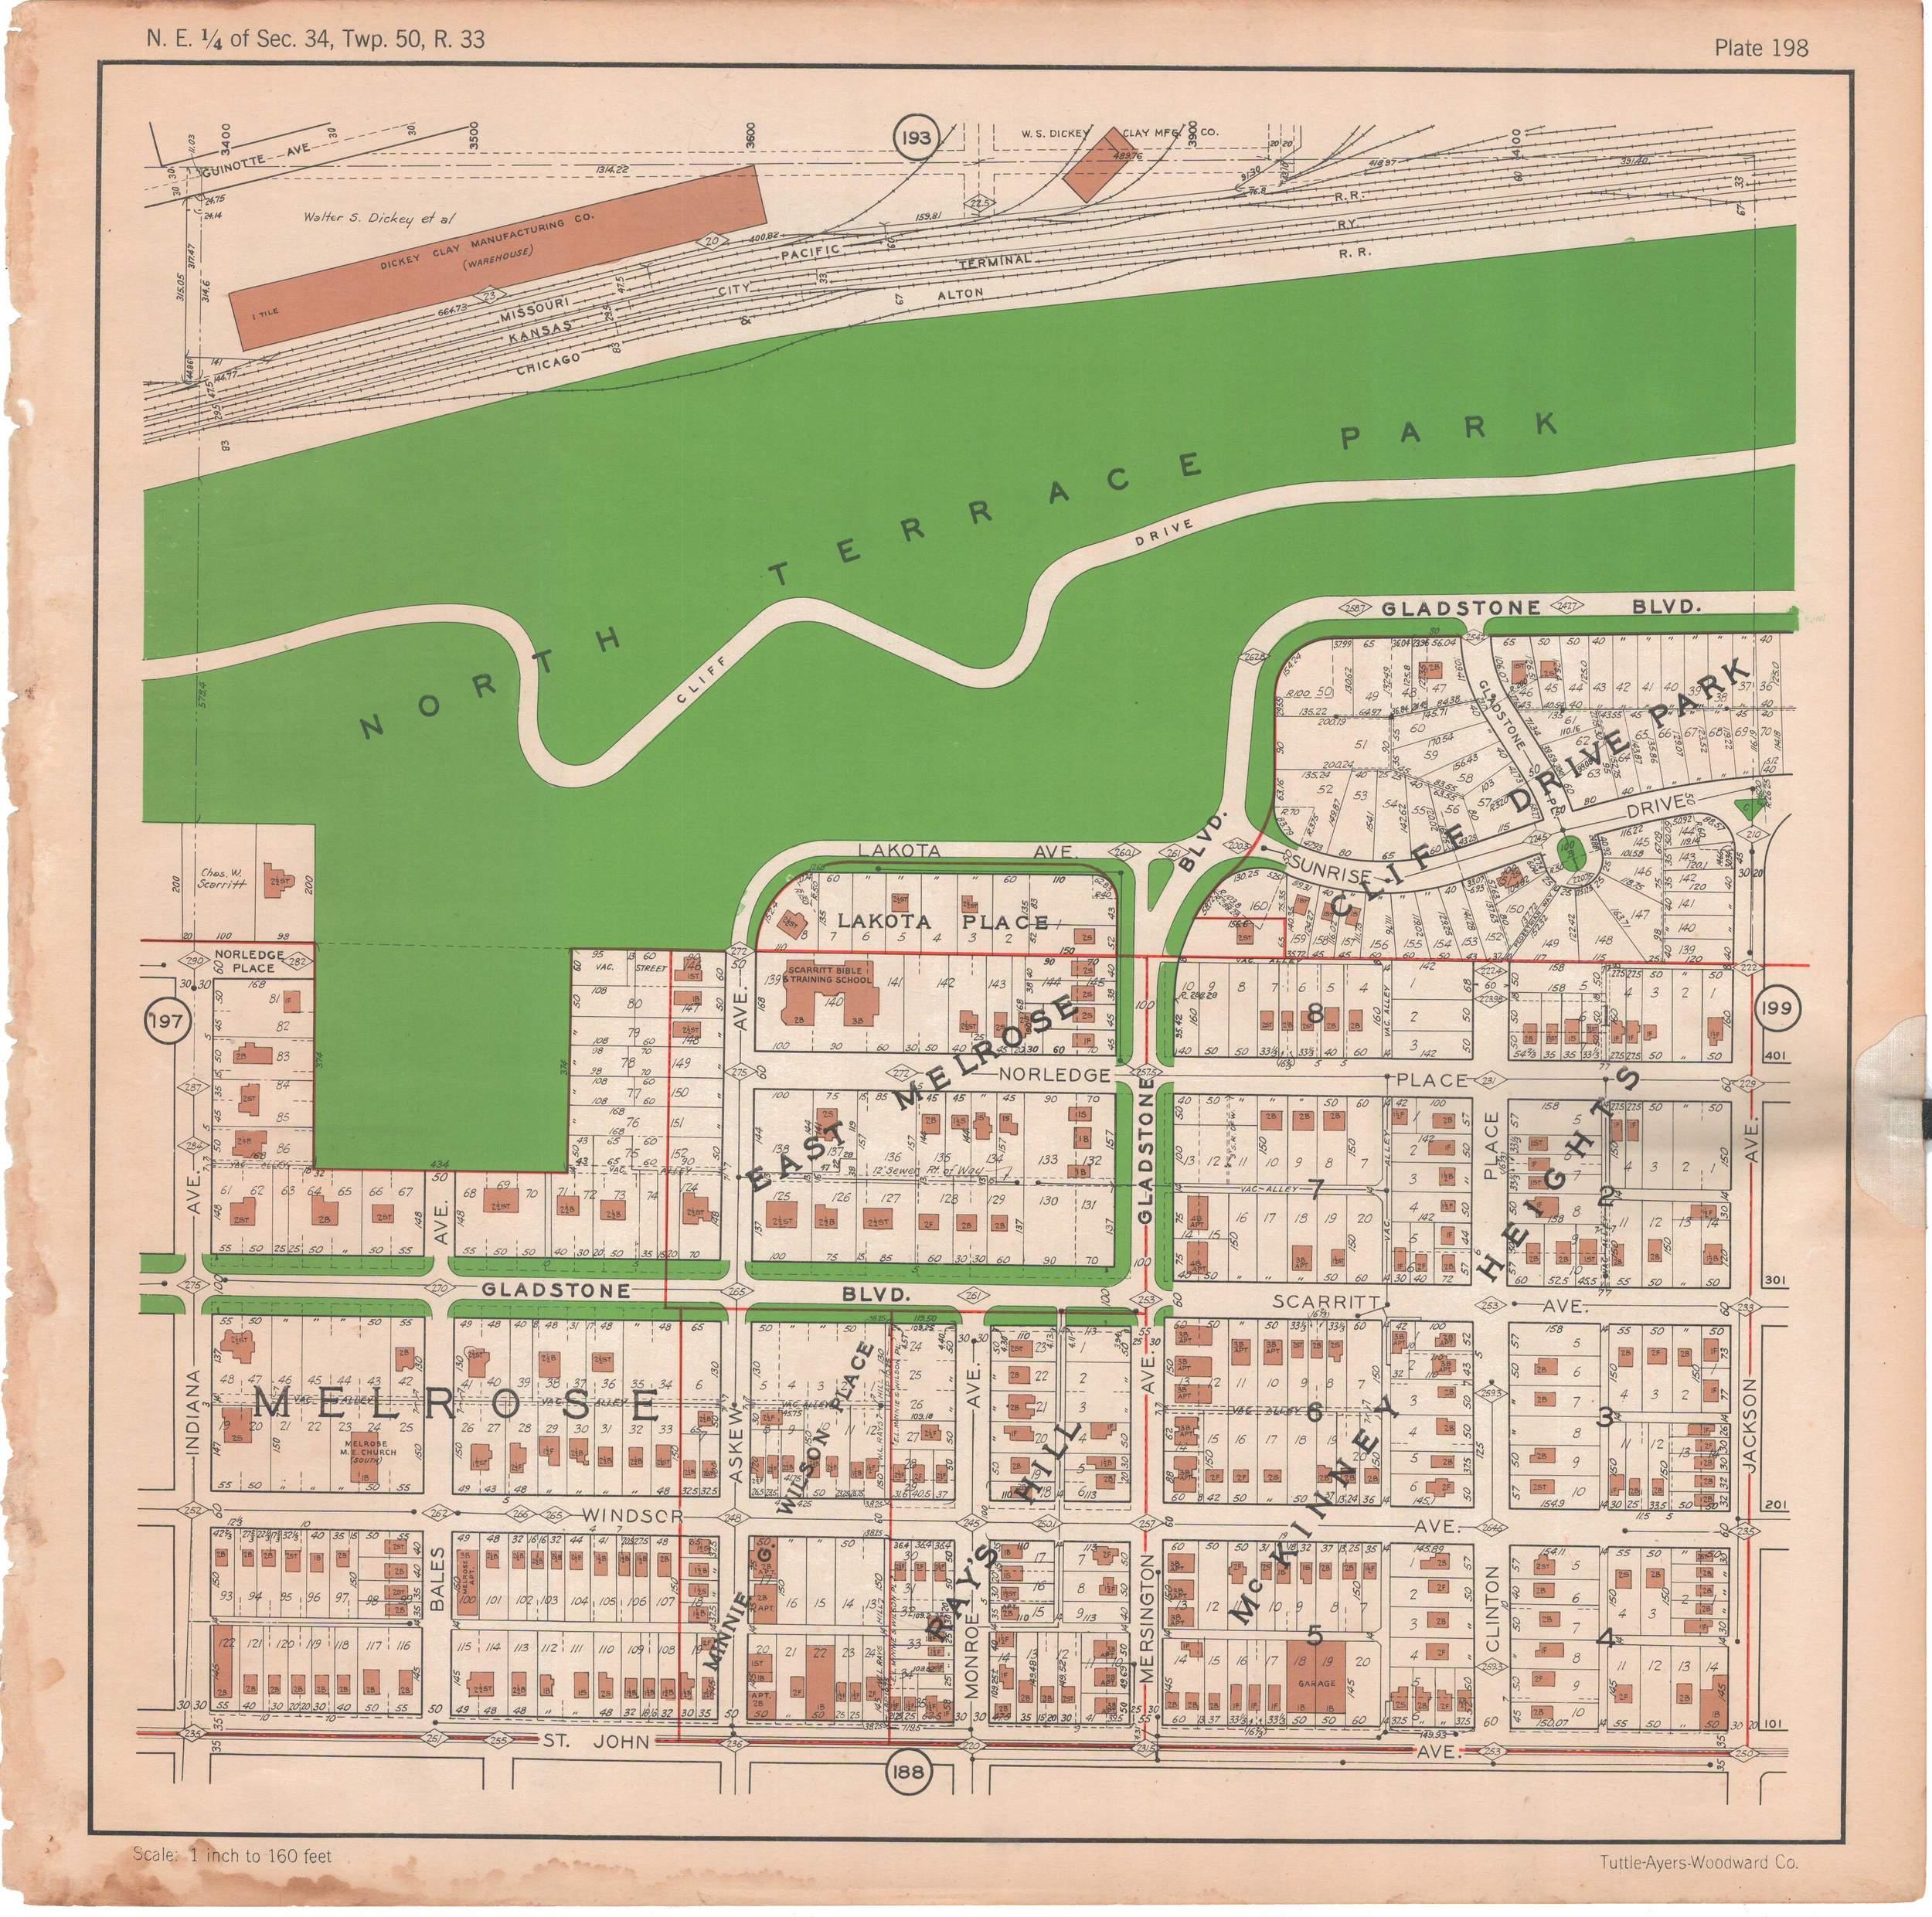 1925 TUTTLE_AYERS_Plate_198.JPG